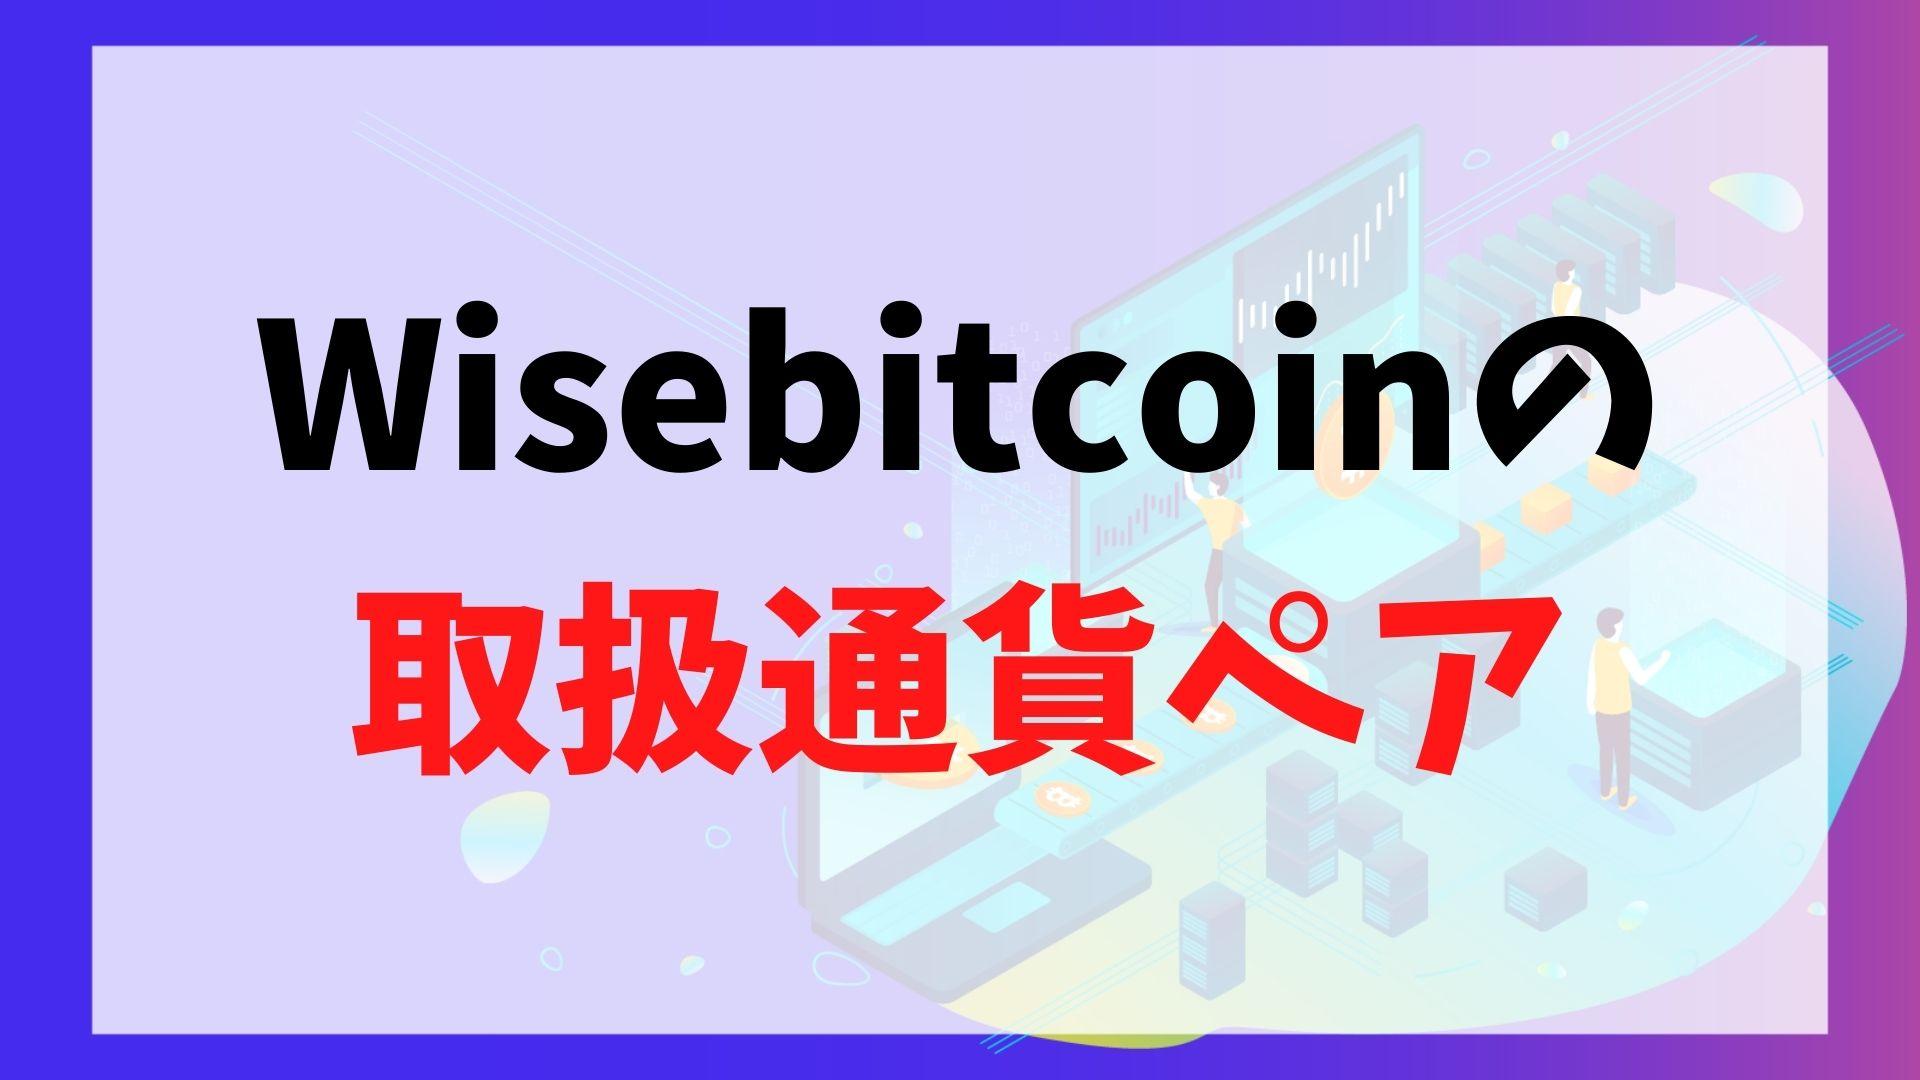 Wisebitcoinの取扱通貨ペア